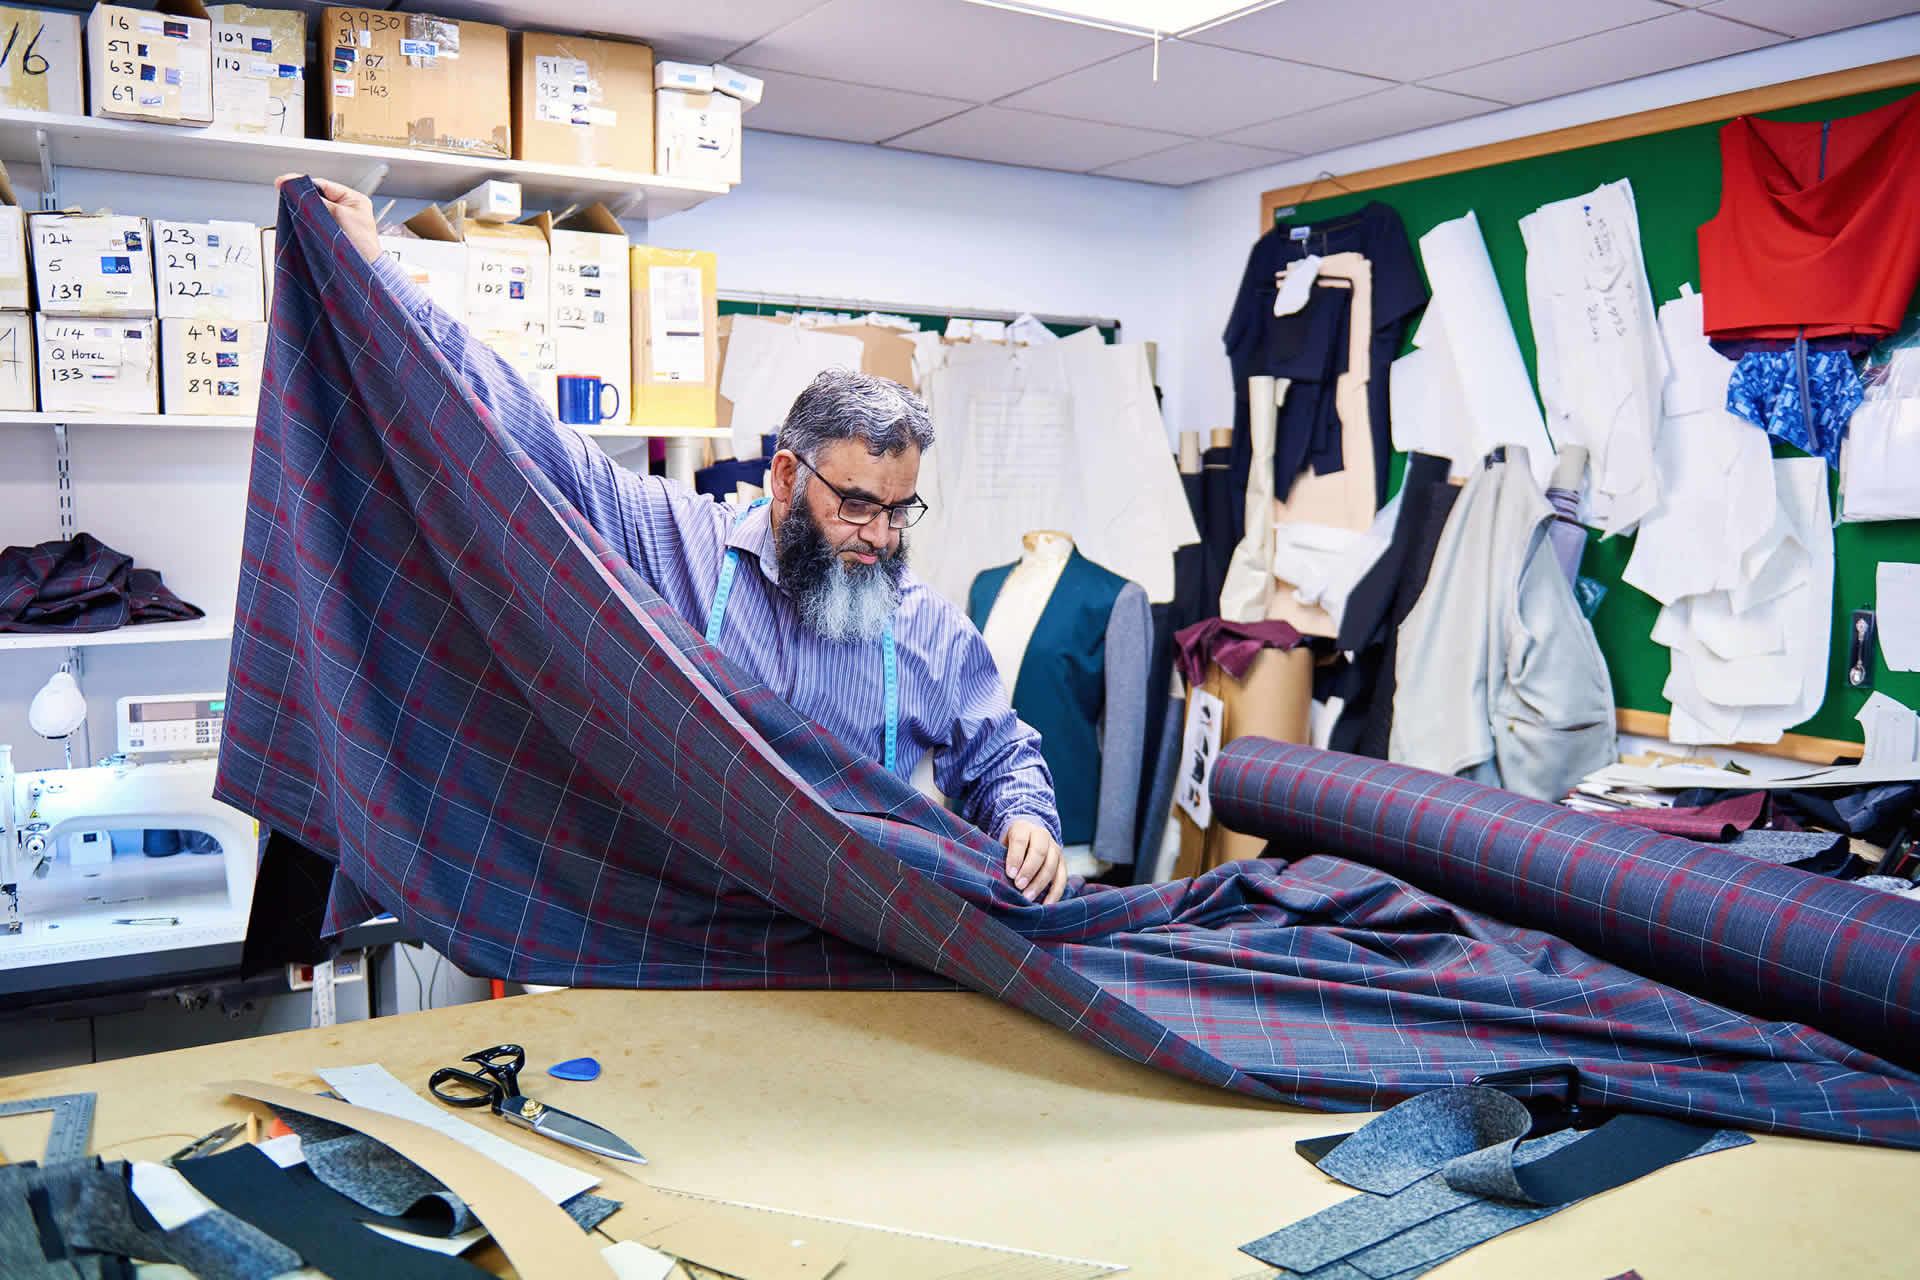 Incorporating diversity in your uniform design